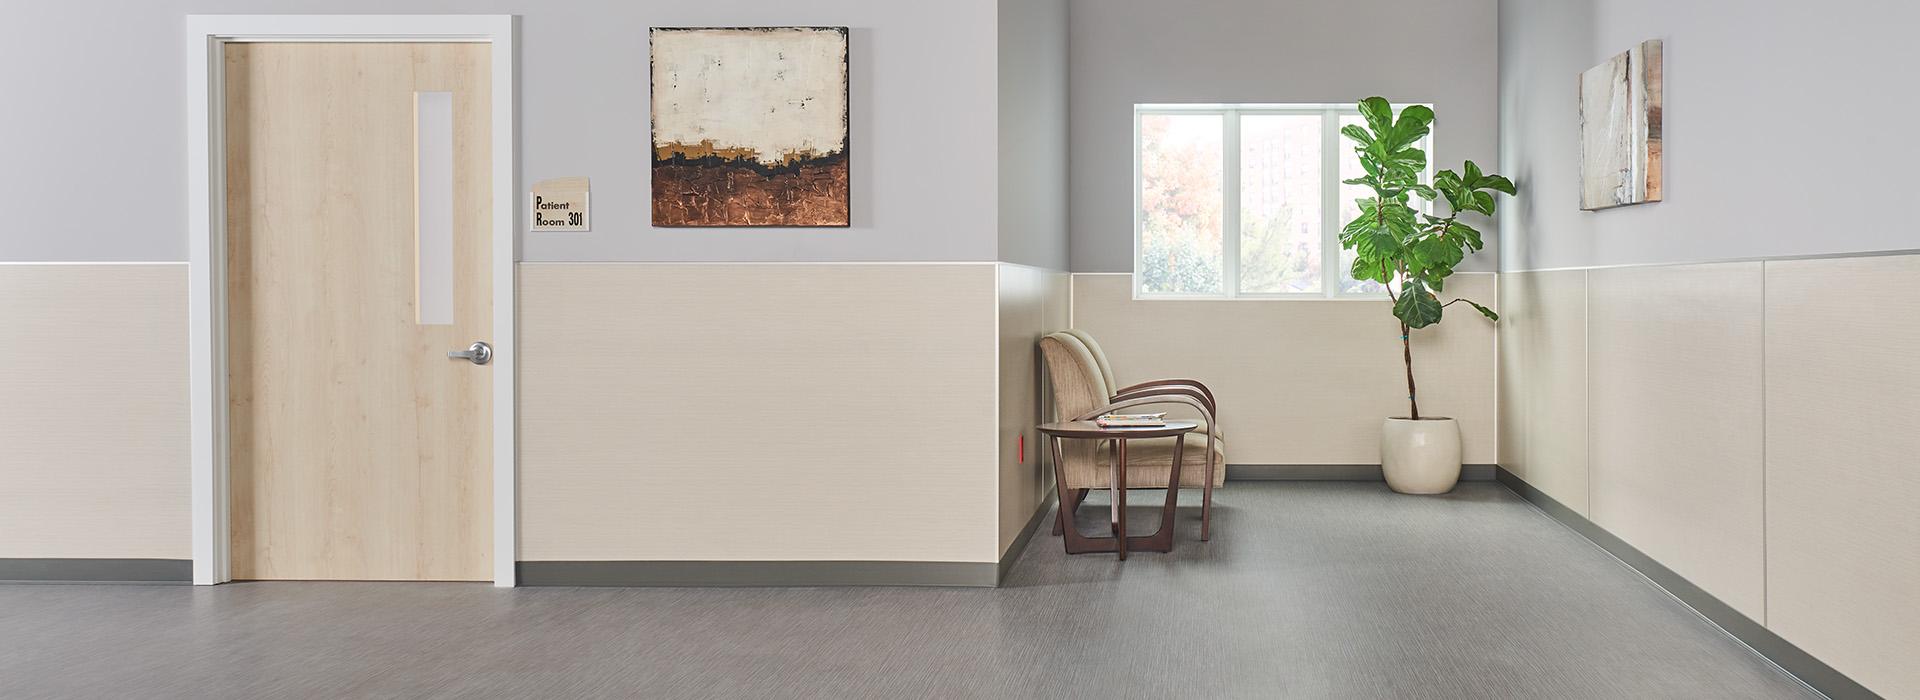 Hospital hallway 8826 Neutral Twill HardStop